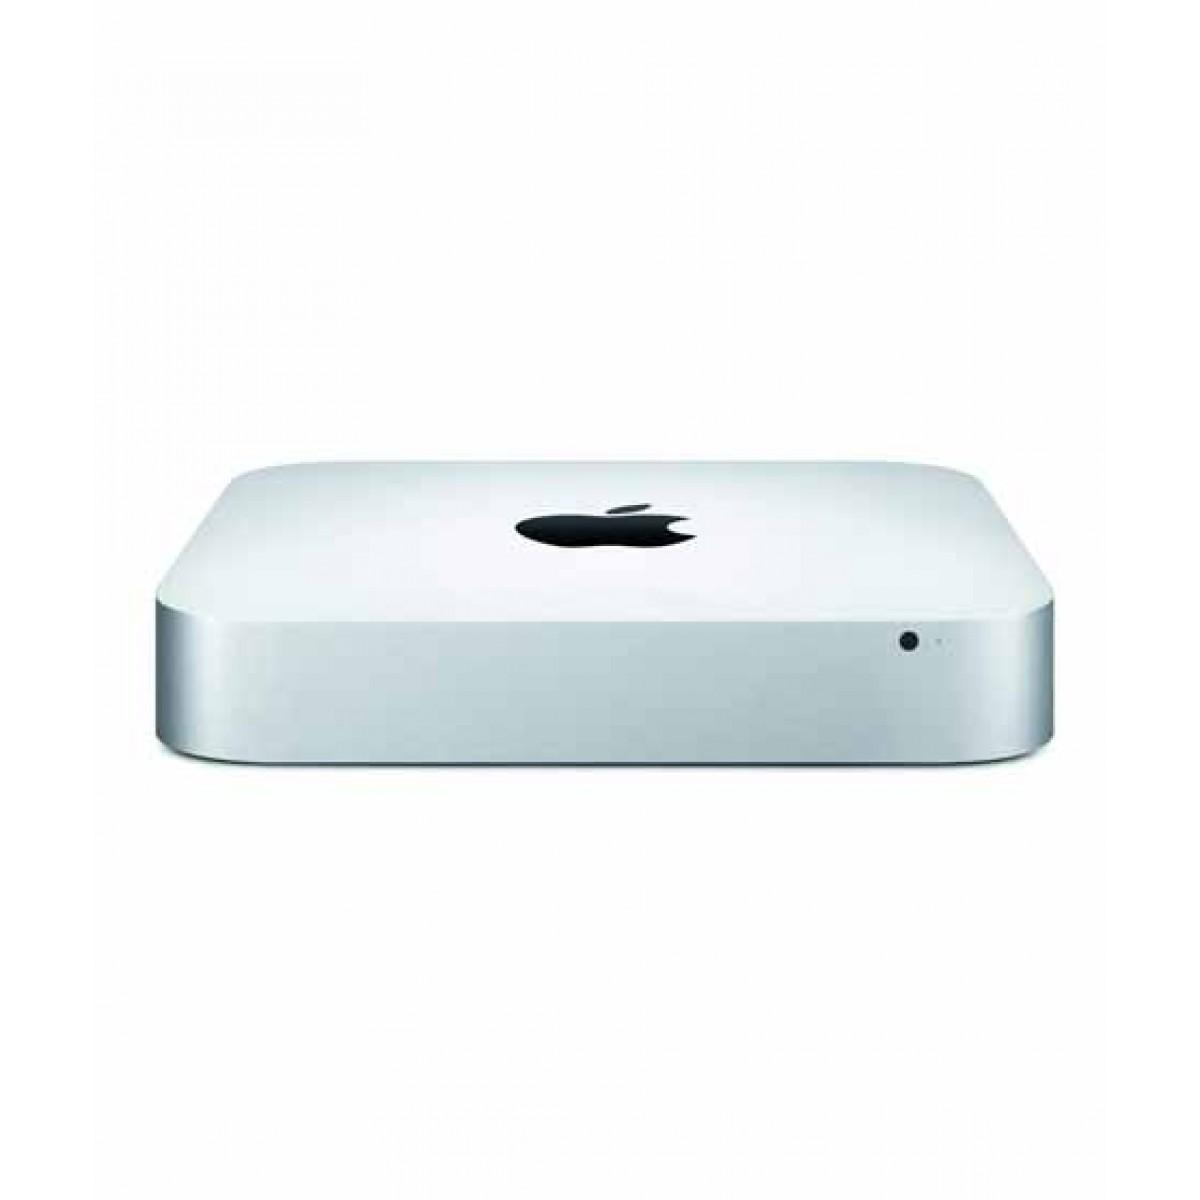 Apple Mac Mini (MGEM2)